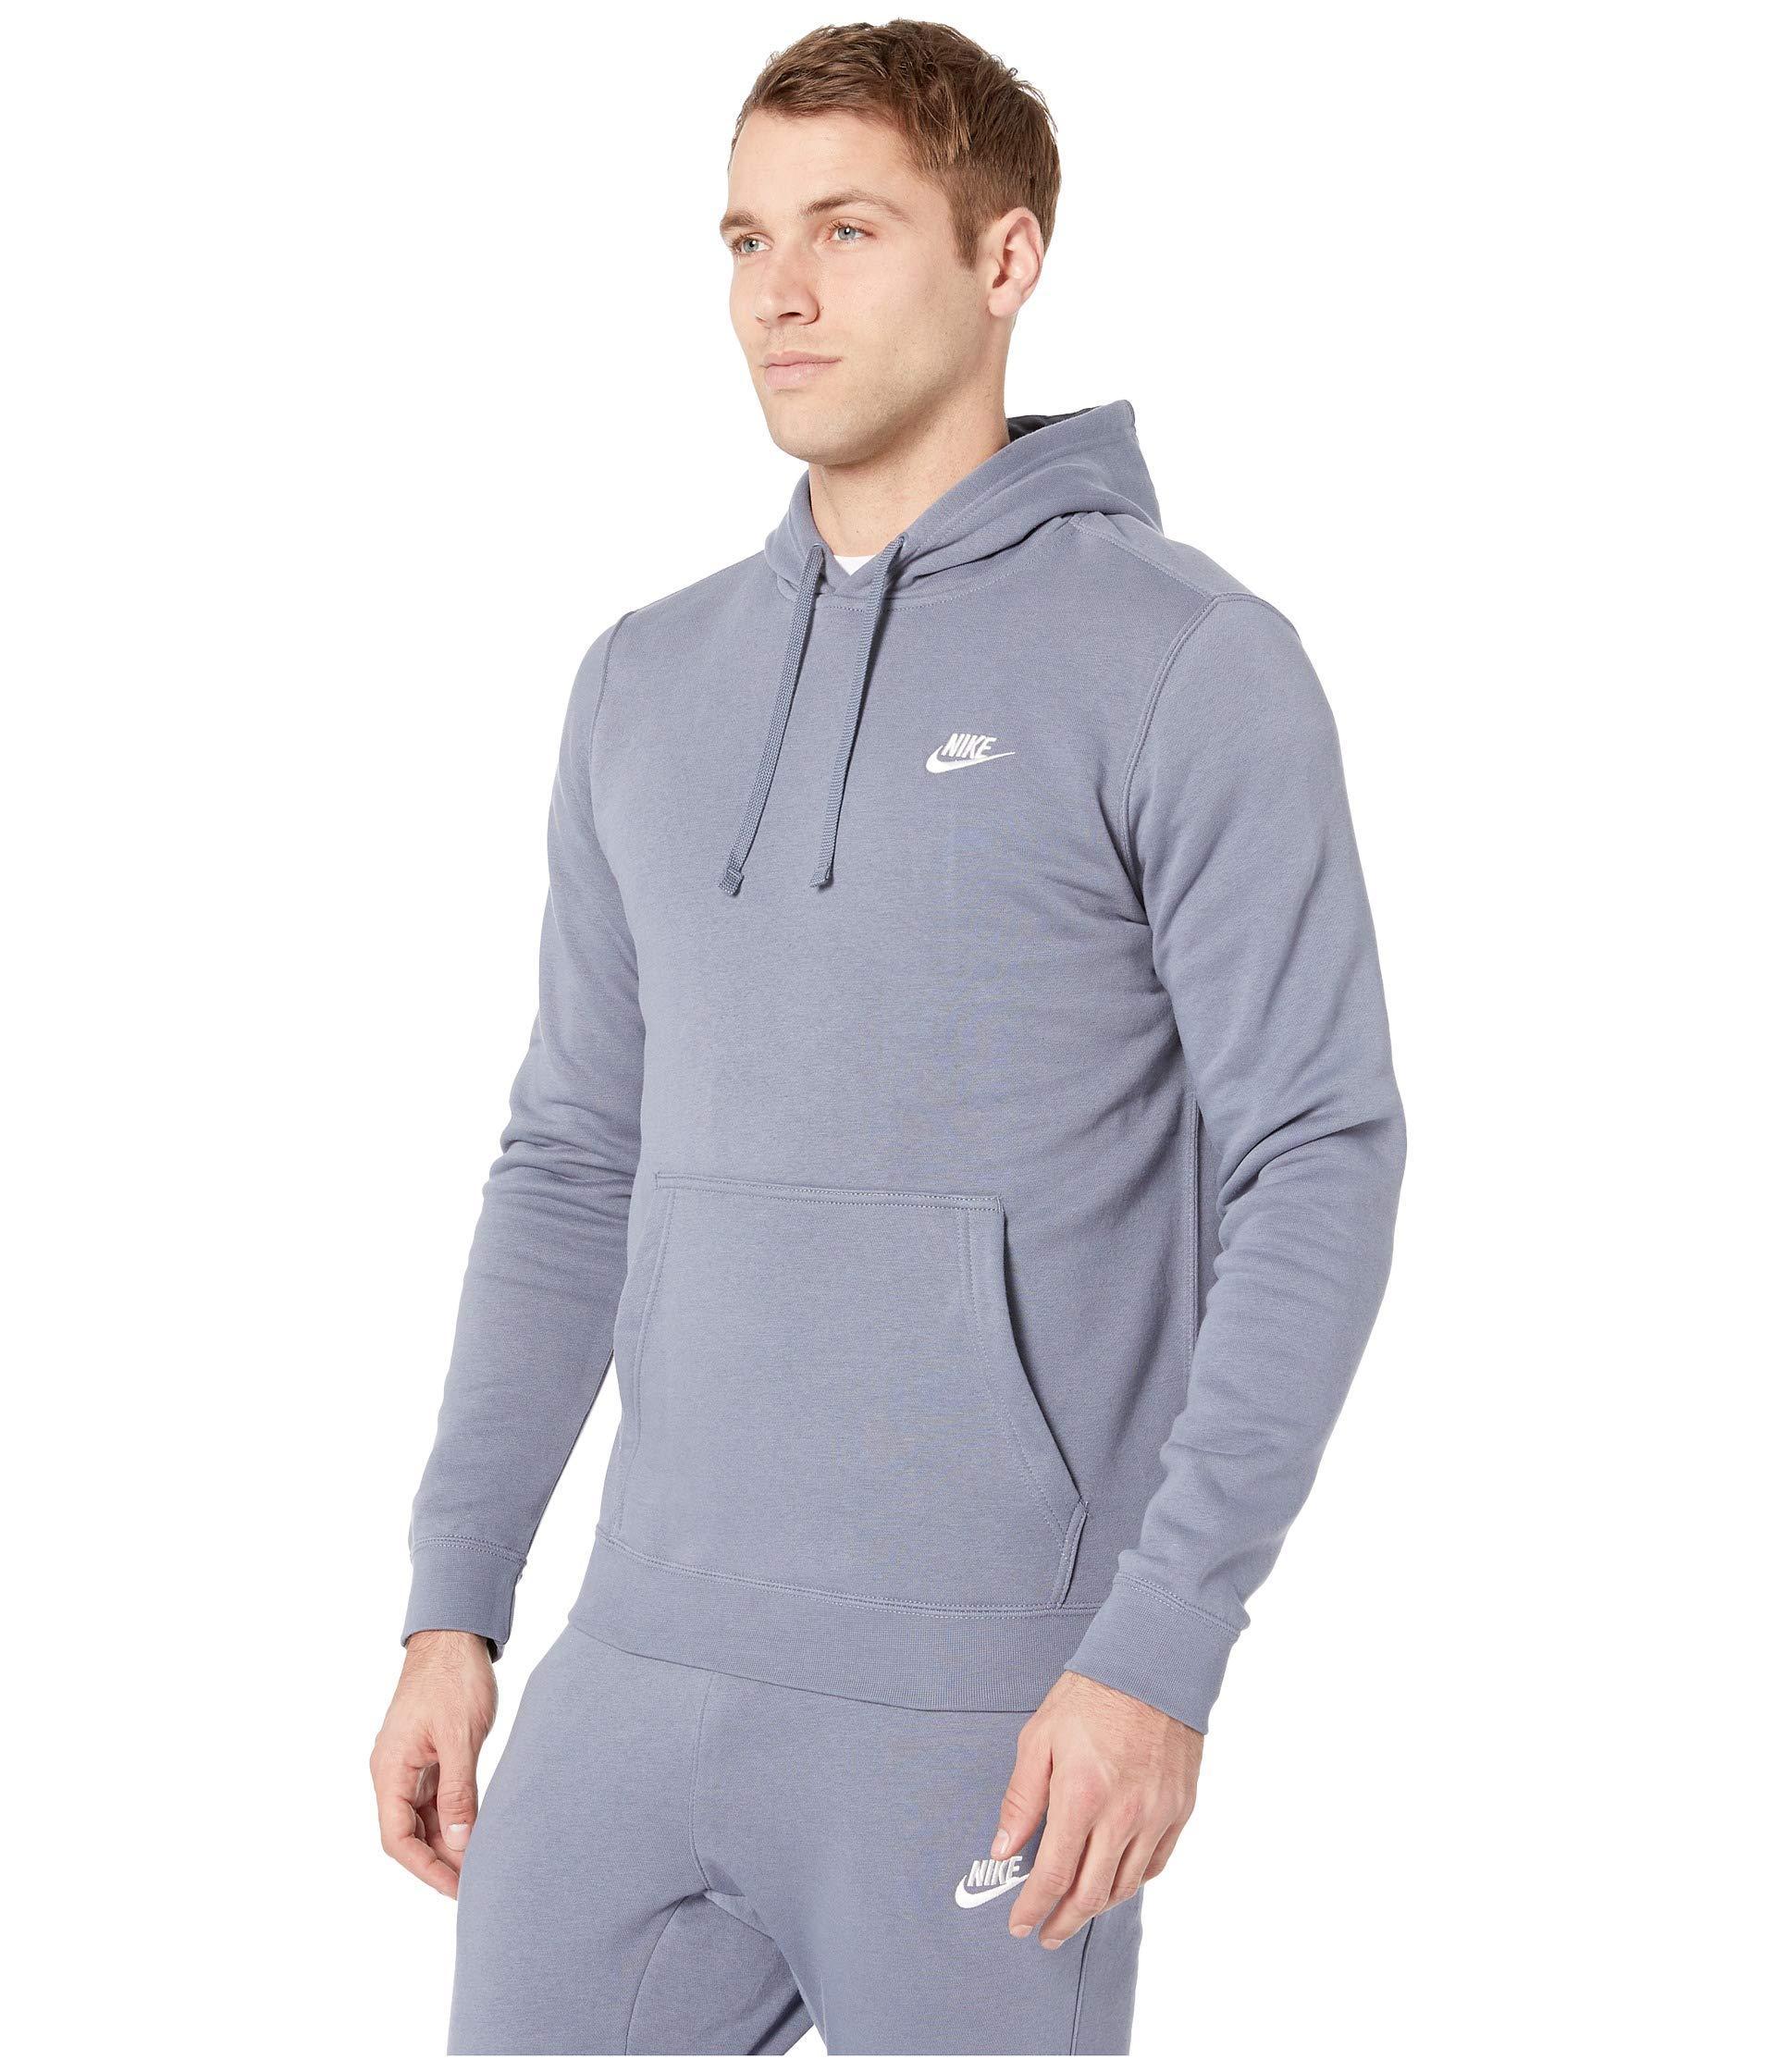 96214ded7be7d7 Lyst - Nike Club Fleece Pullover Hoodie in Blue for Men